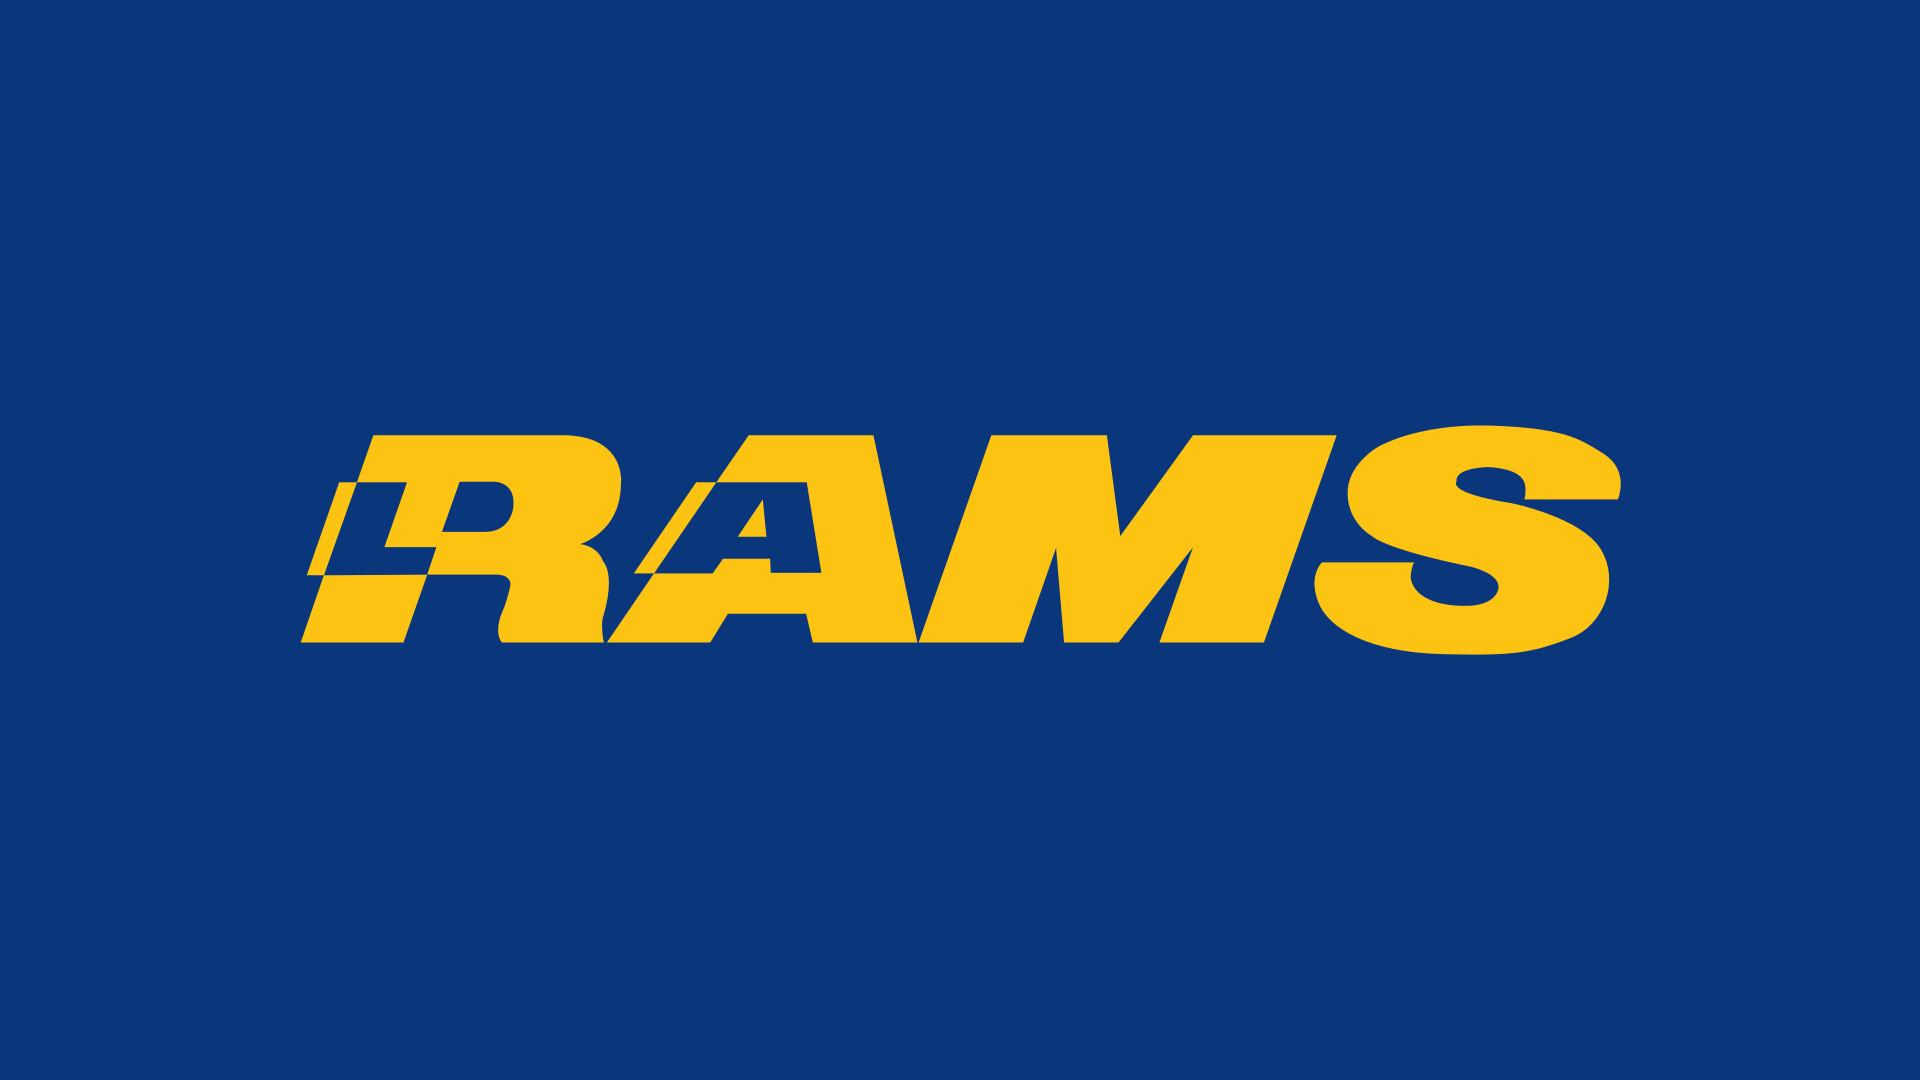 Anyone got an LA Rams wallpaper? https://i.imgur.com/mSROKPw.png